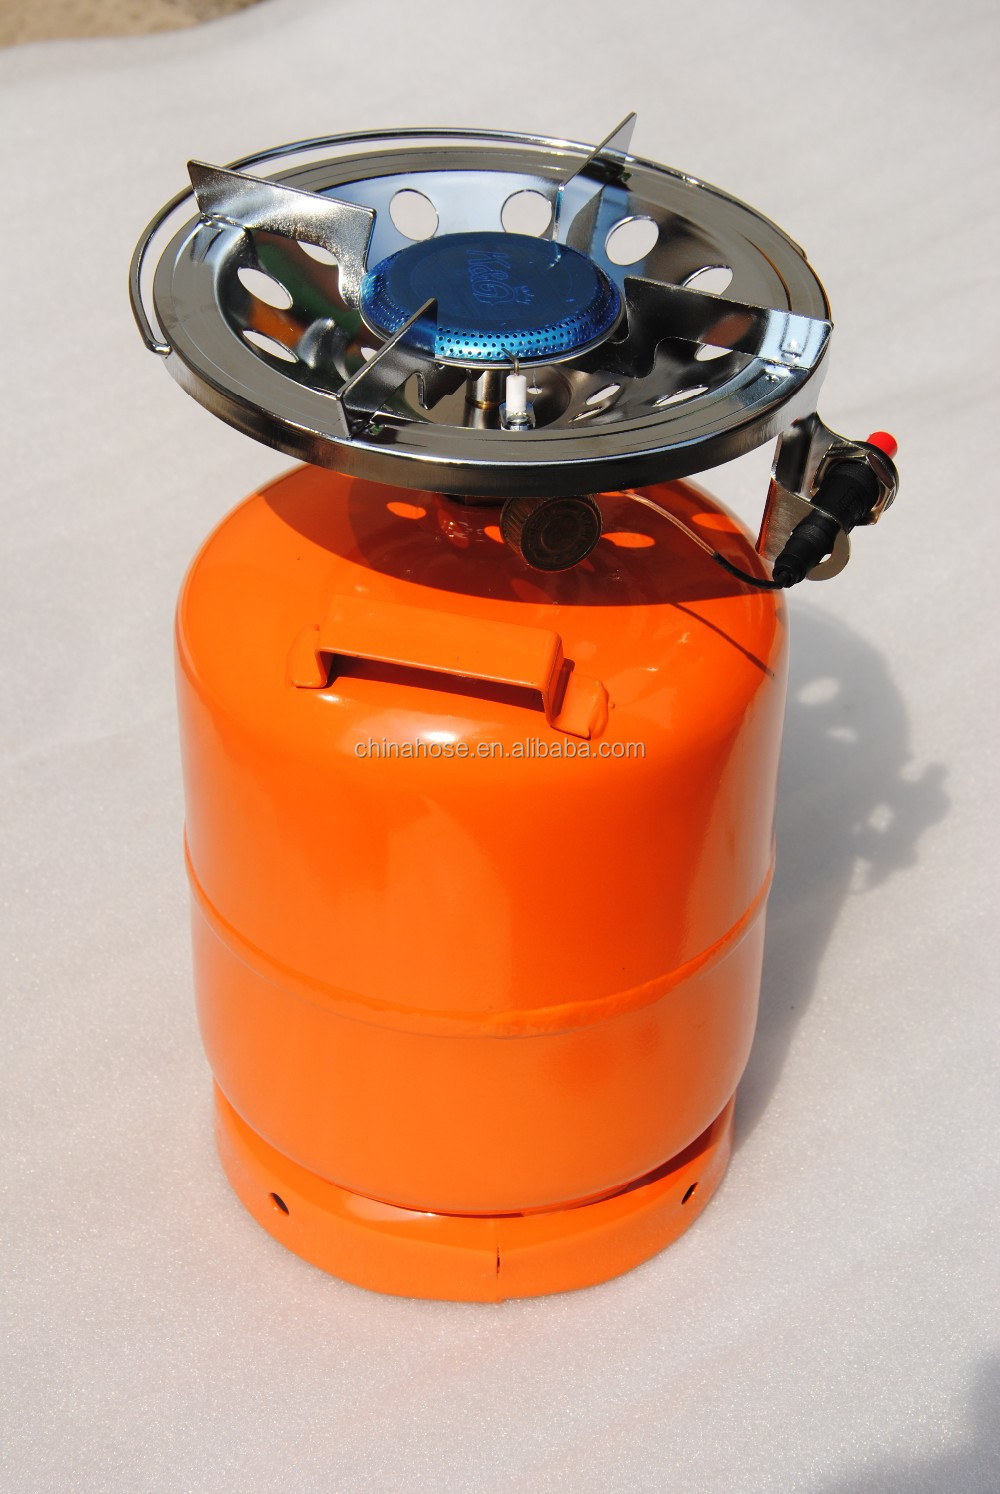 Jg Nigeria Portable Camping Gas Stove Kitchen Appliance